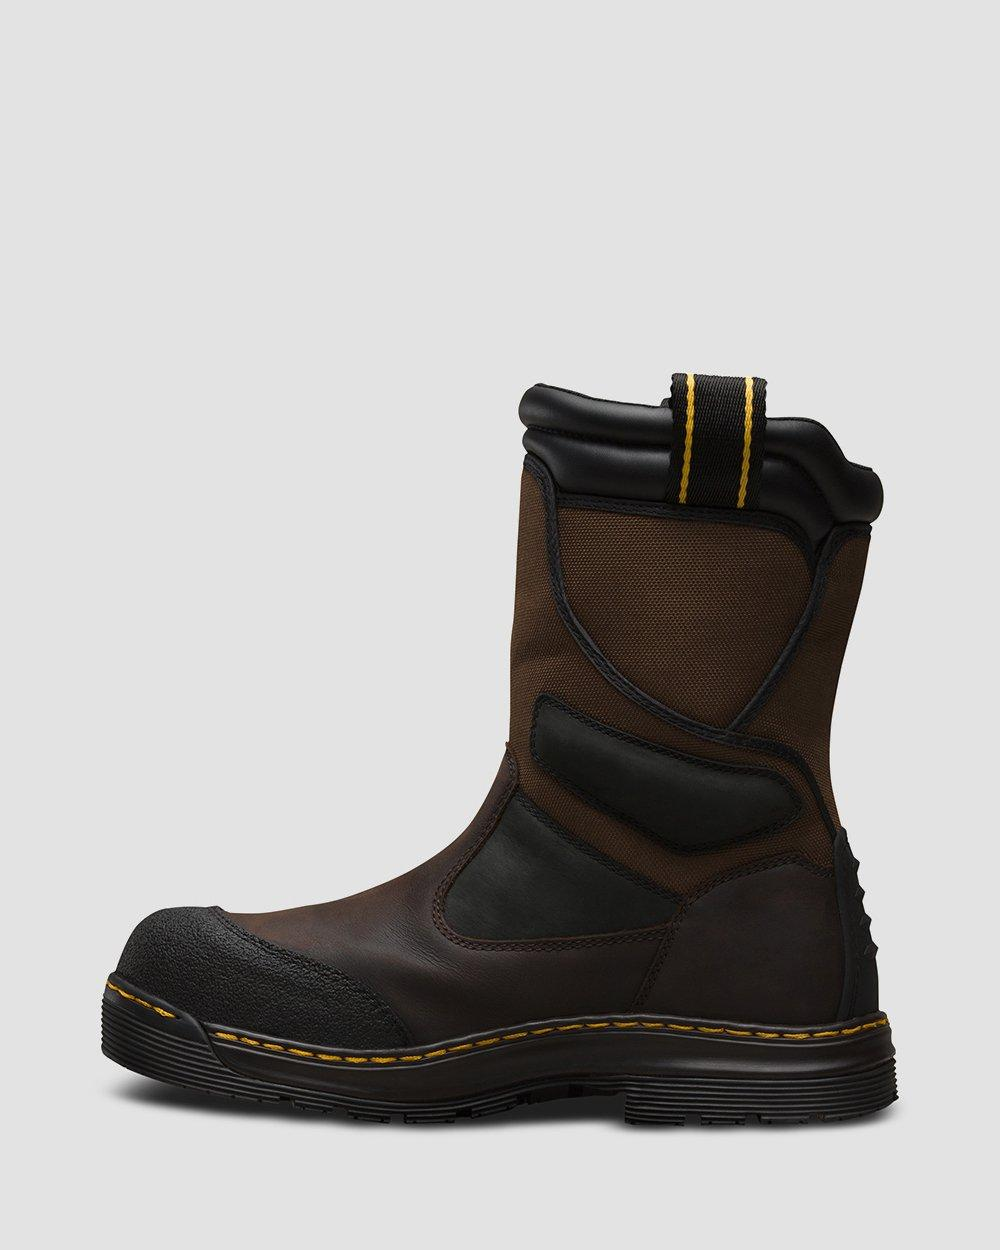 Dr Martens Turbine Composite Toe Cap Safety Boots Doc Martins DM/'s 6923